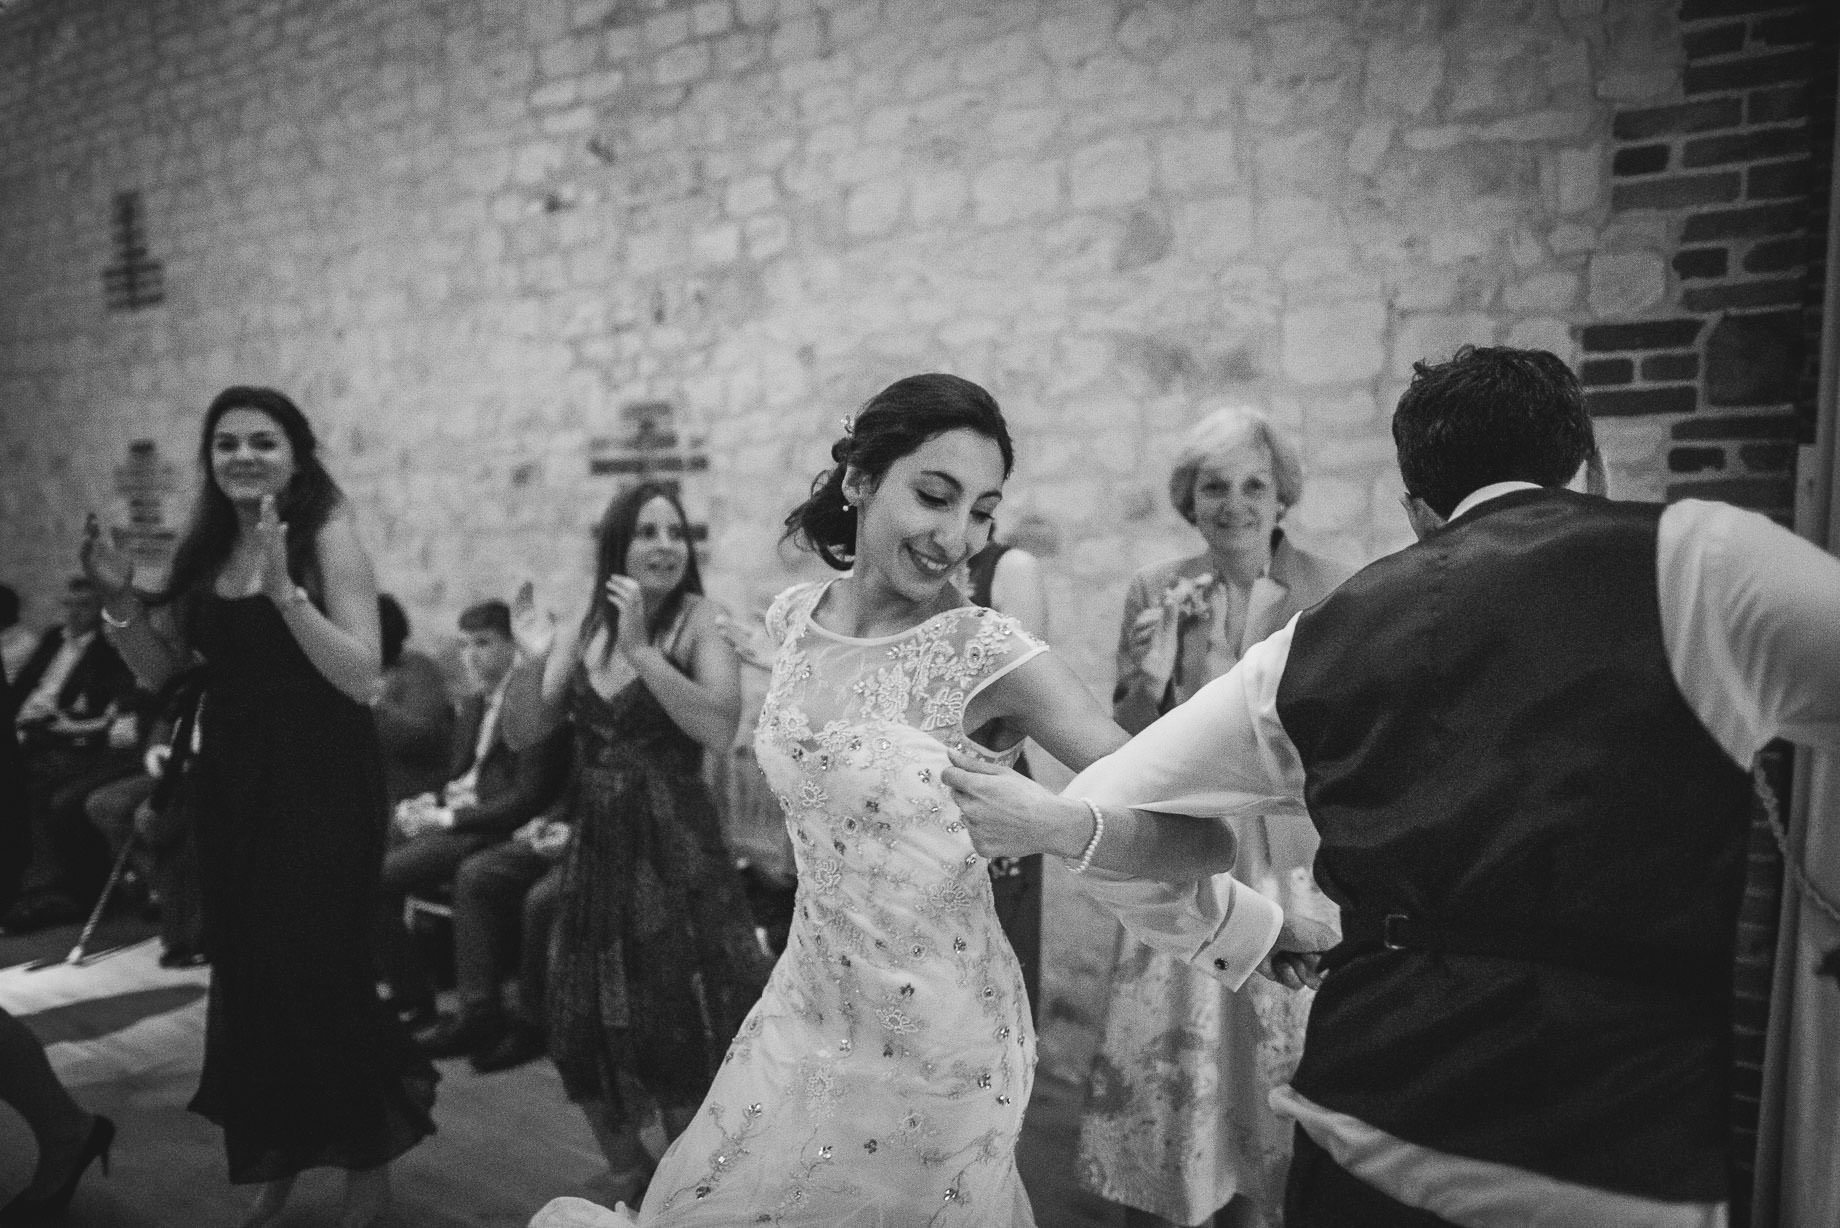 bury-court-barn-wedding-photography-guy-collier-photography-nadia-tom-184-of-184